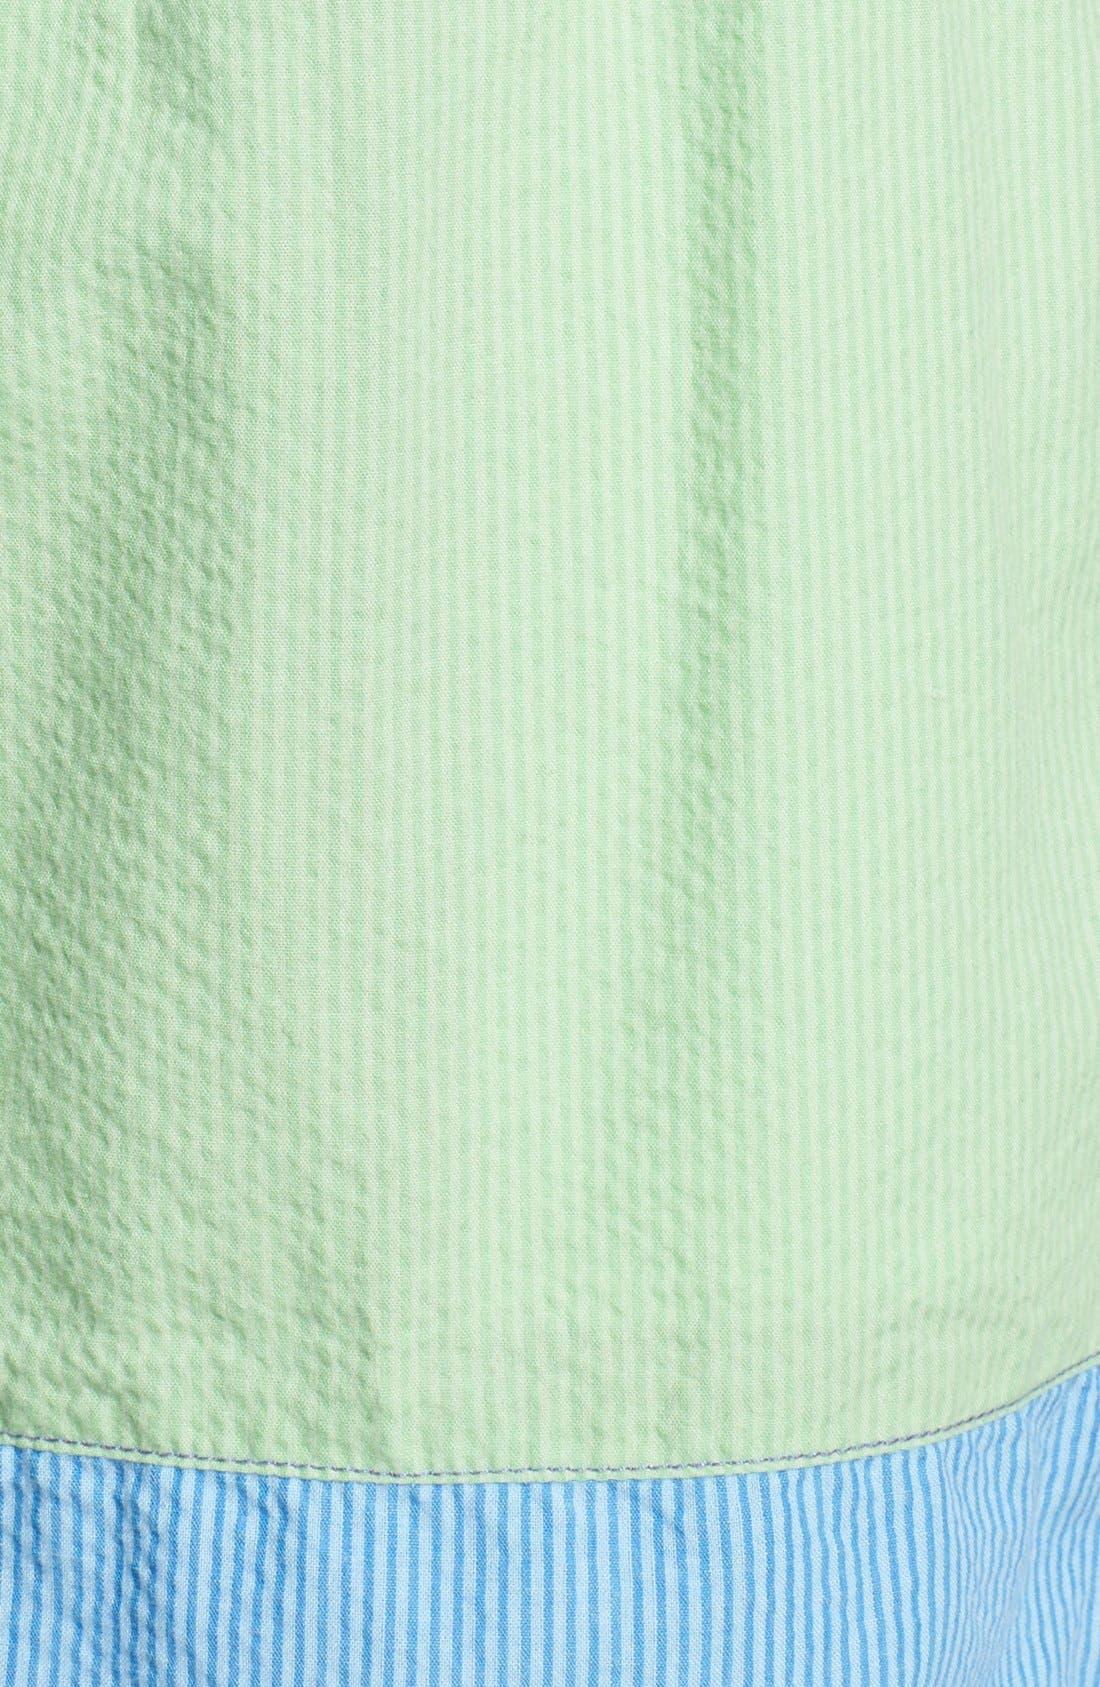 Alternate Image 3  - Vineyard Vines 'Bungalow' Swim Trunks